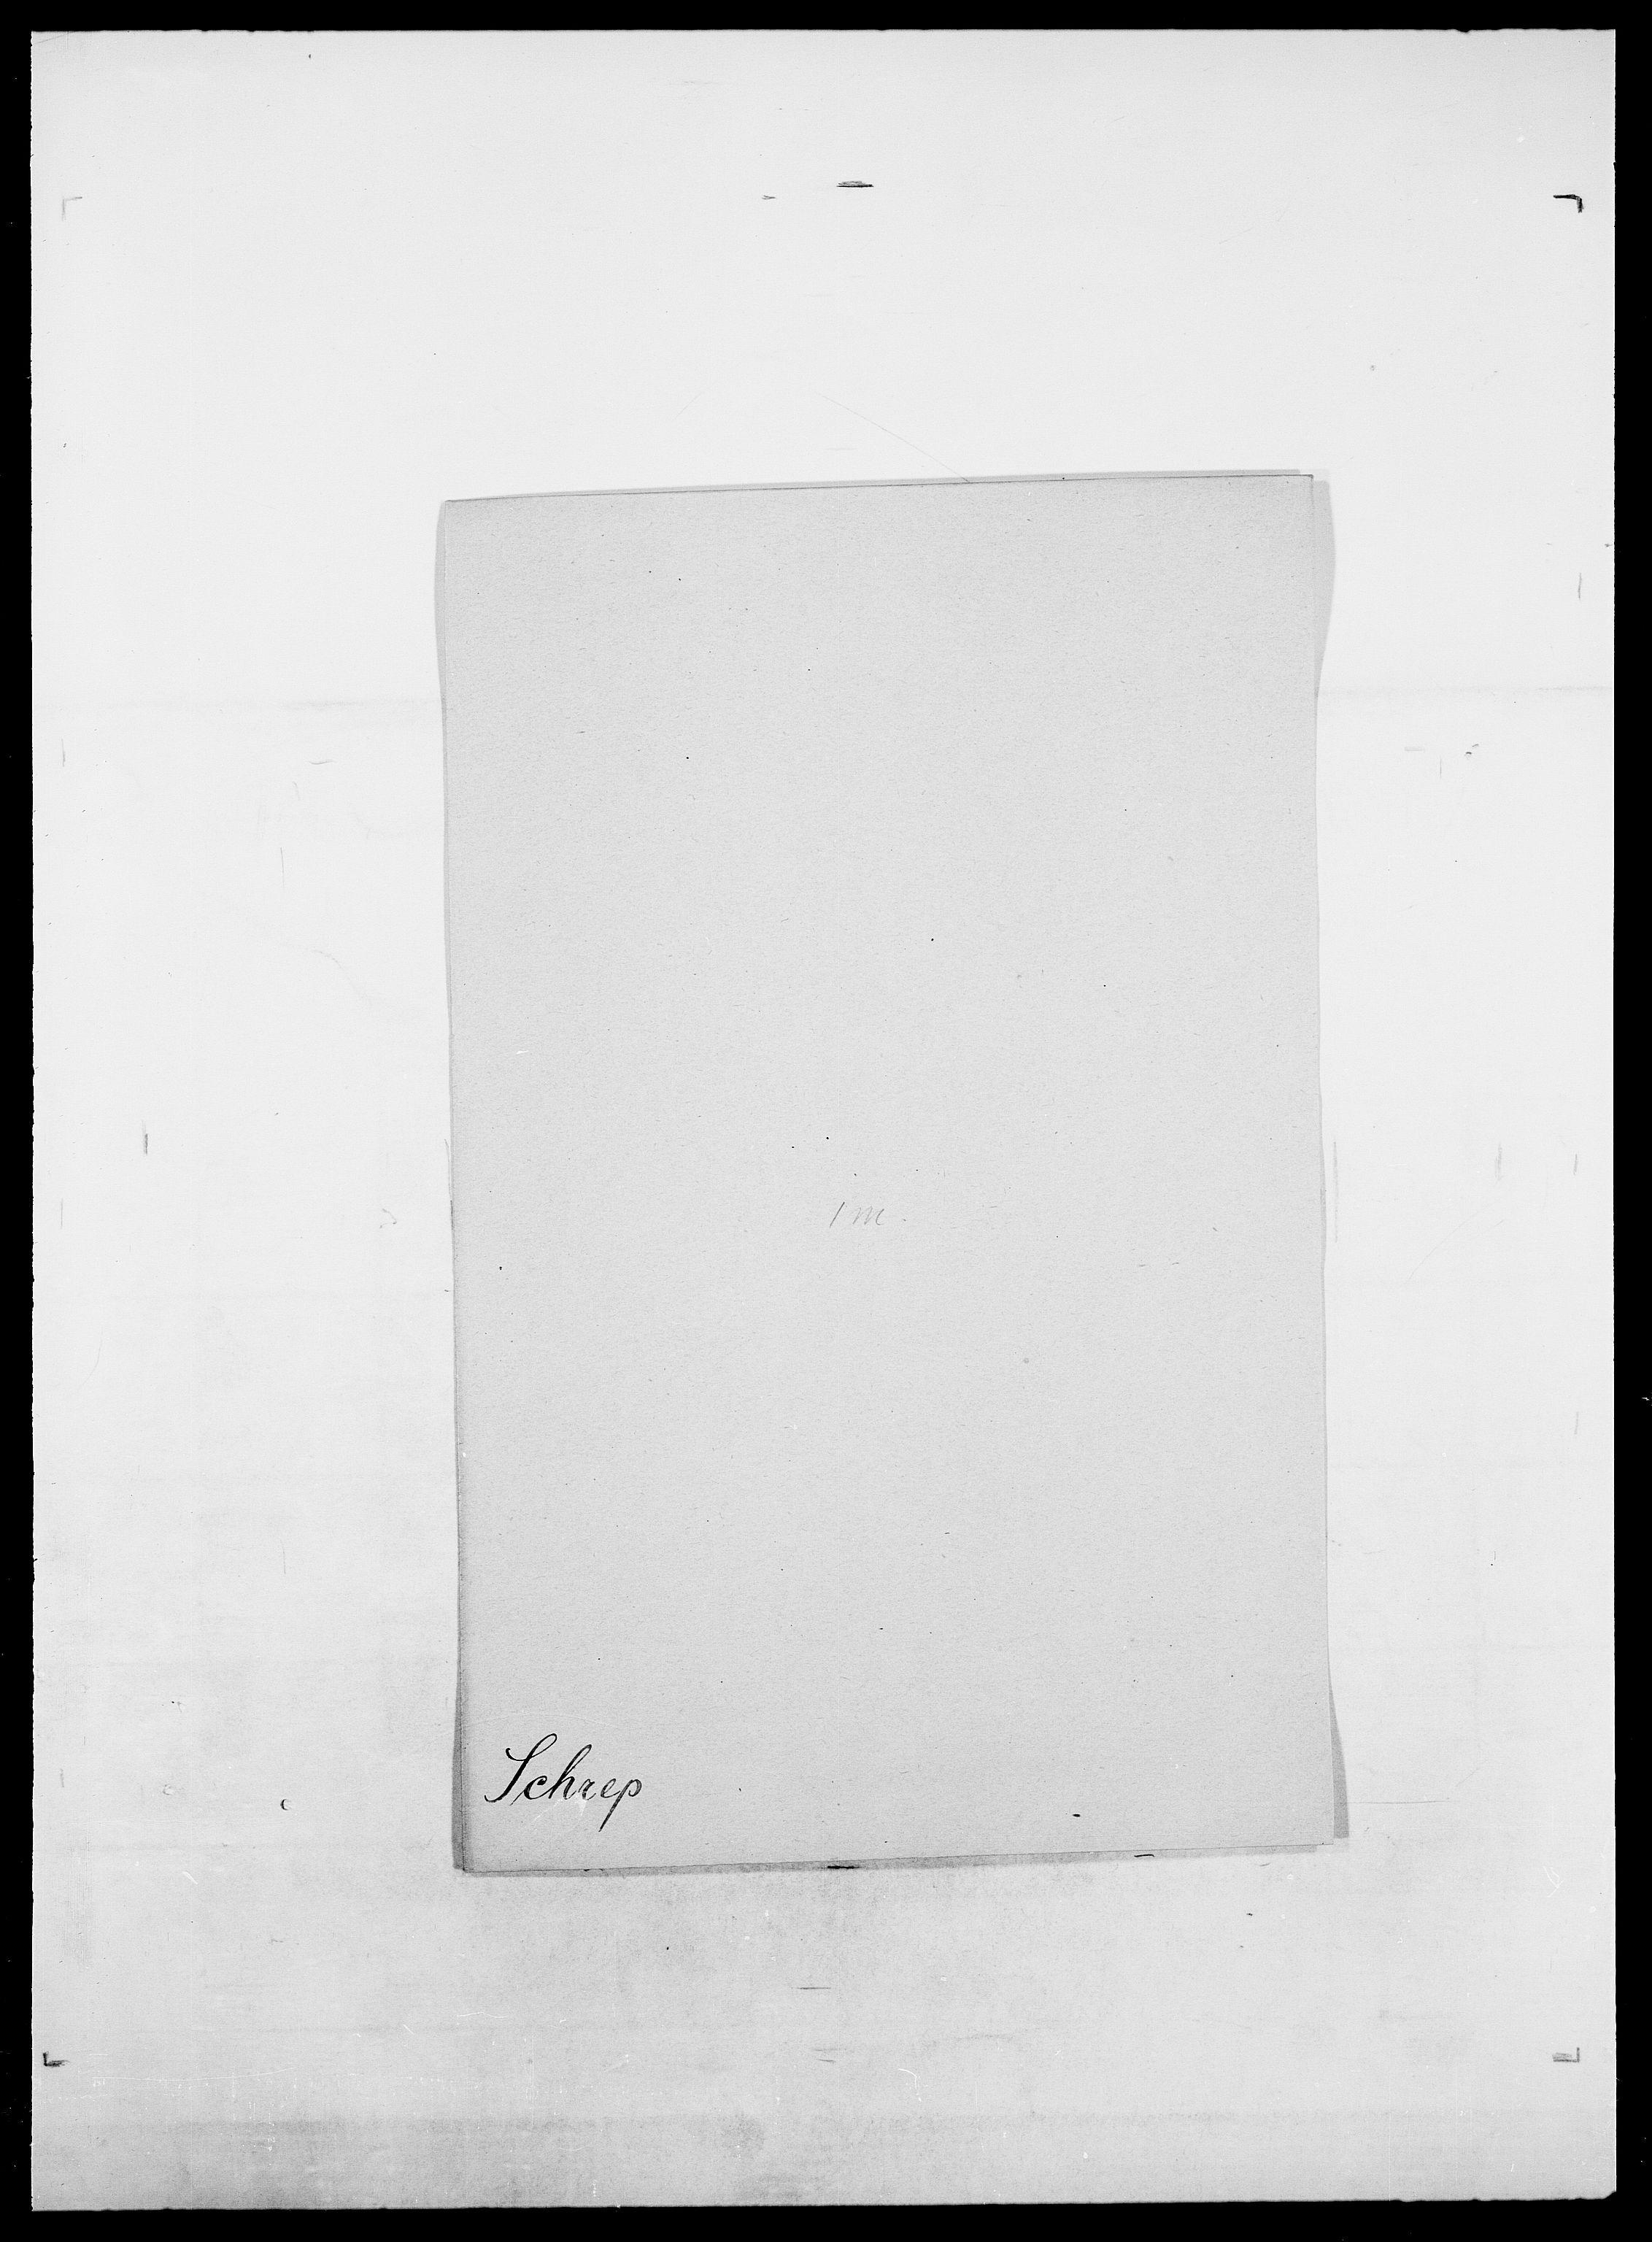 SAO, Delgobe, Charles Antoine - samling, D/Da/L0035: Schnabel - sjetman, s. 157